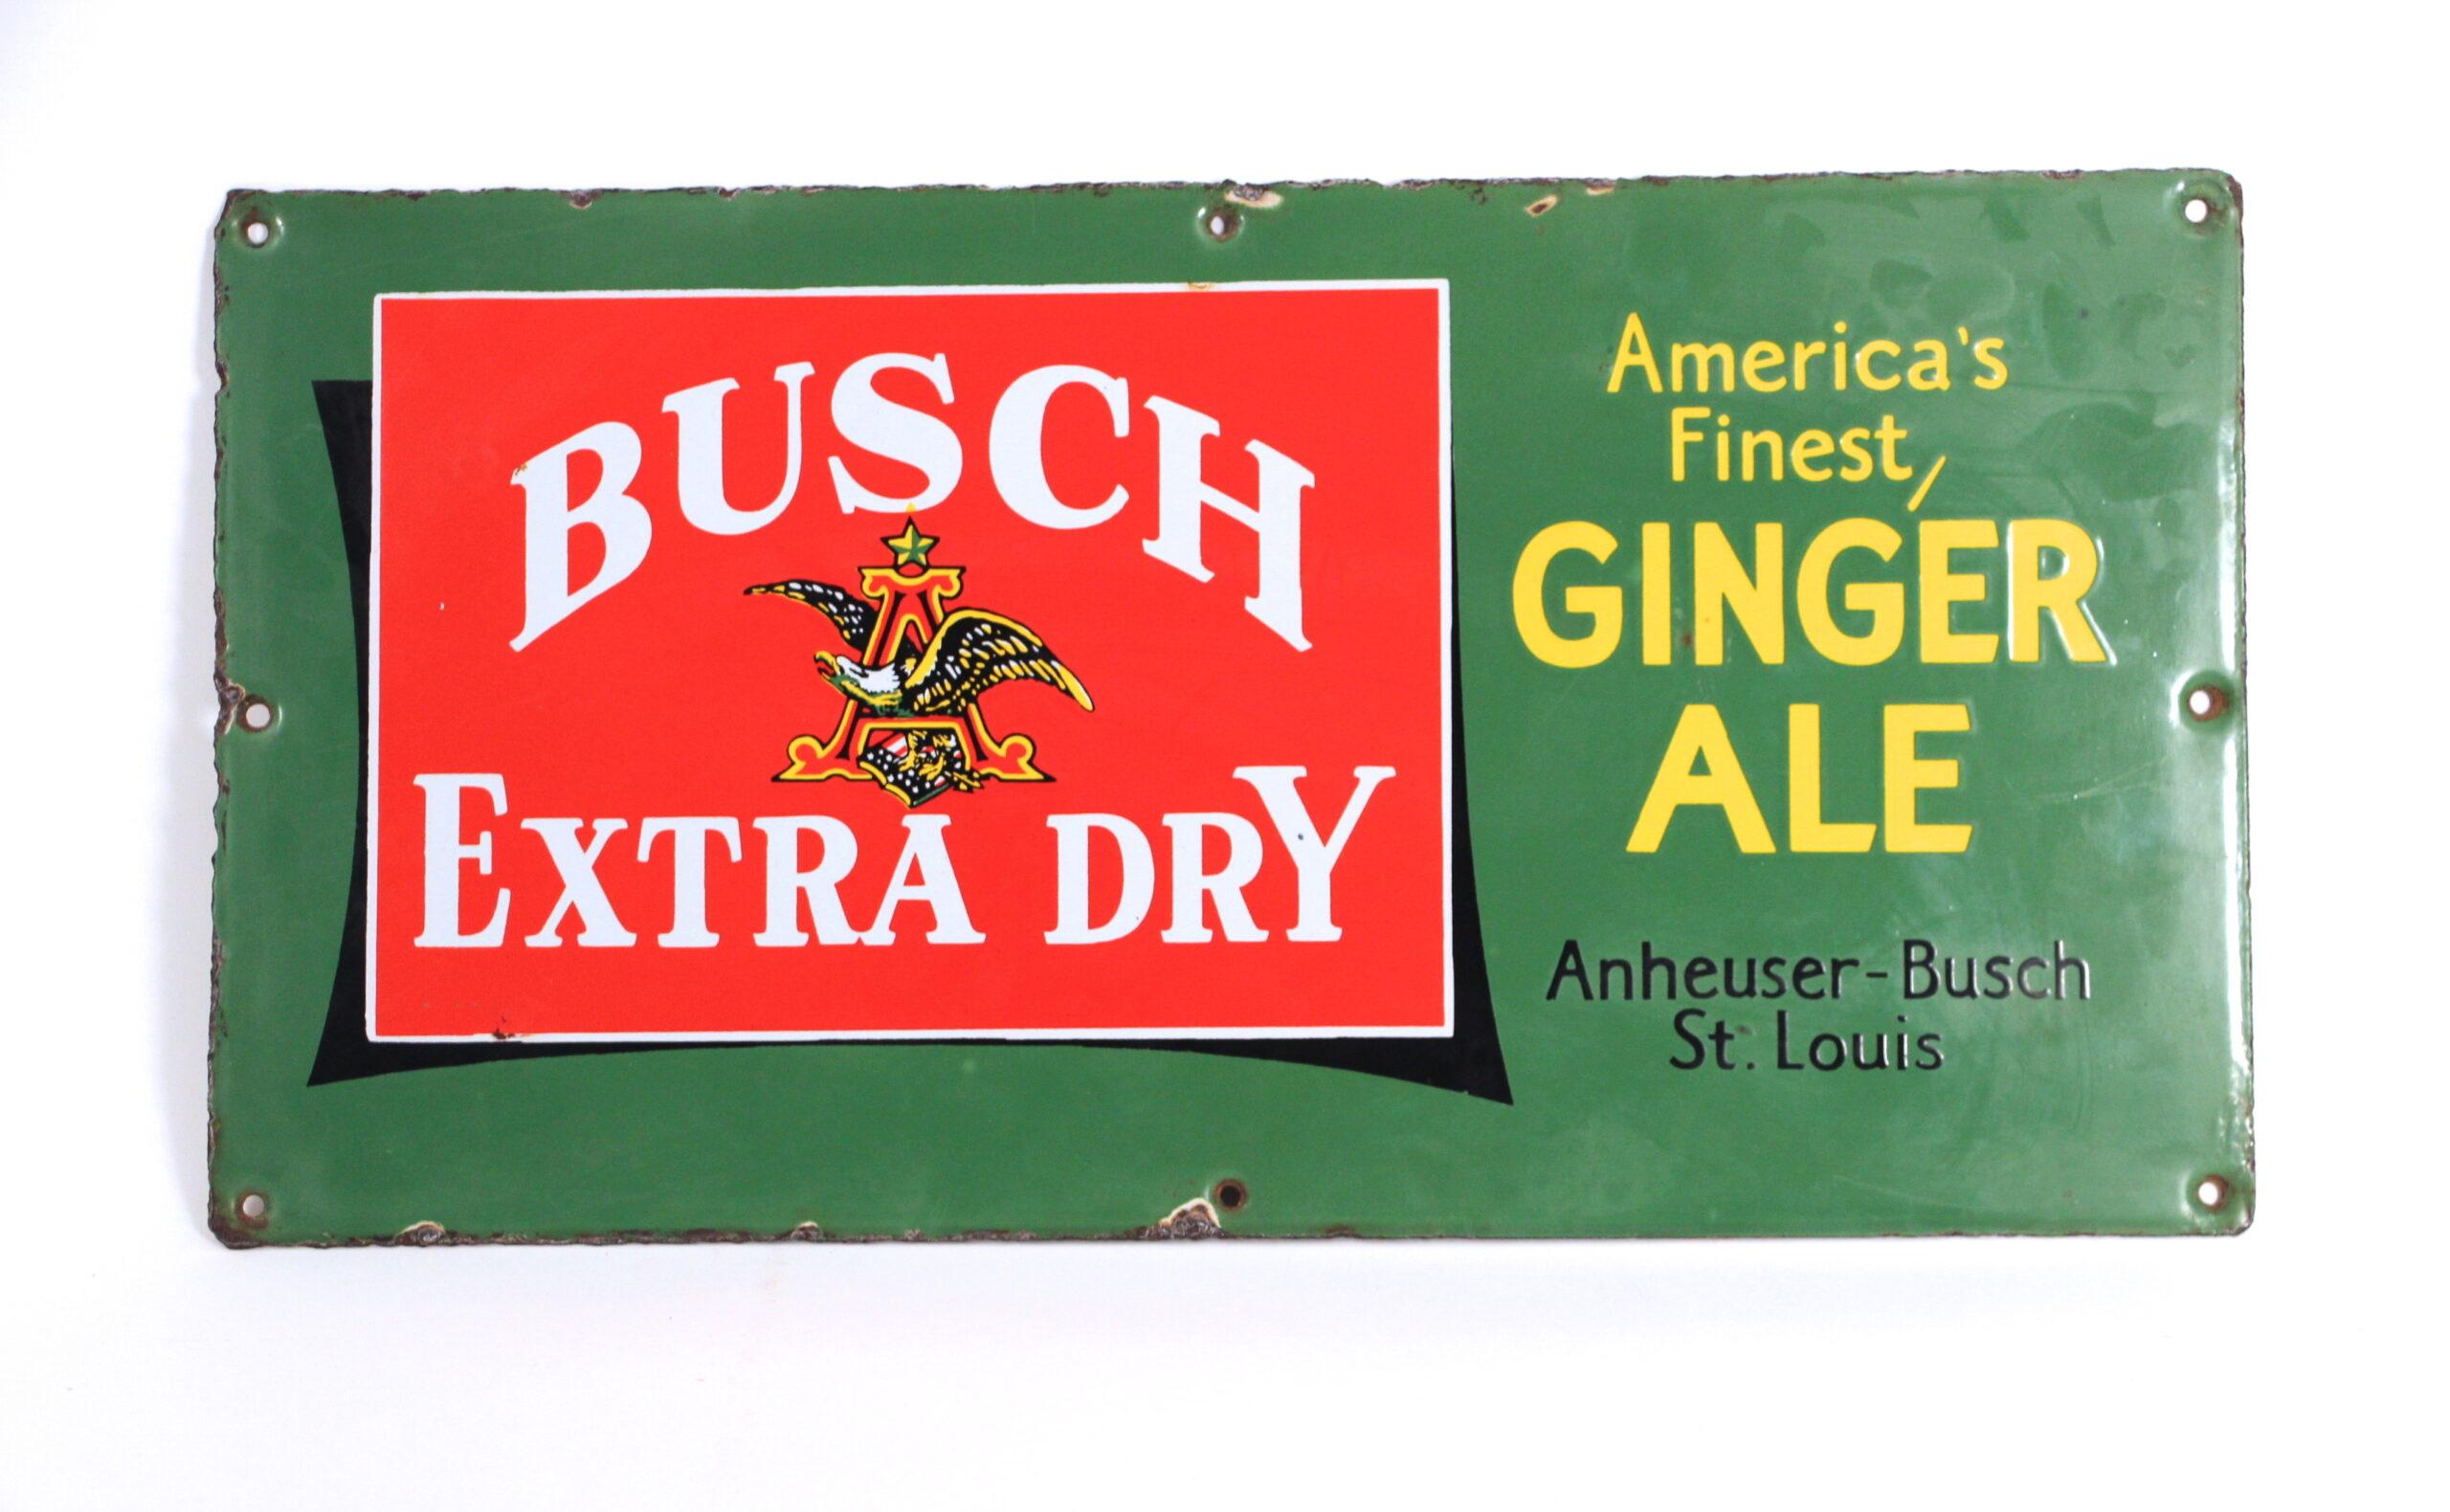 Anheuser-Busch Busch Extra Dry Porcelain Ginger Ale Sign